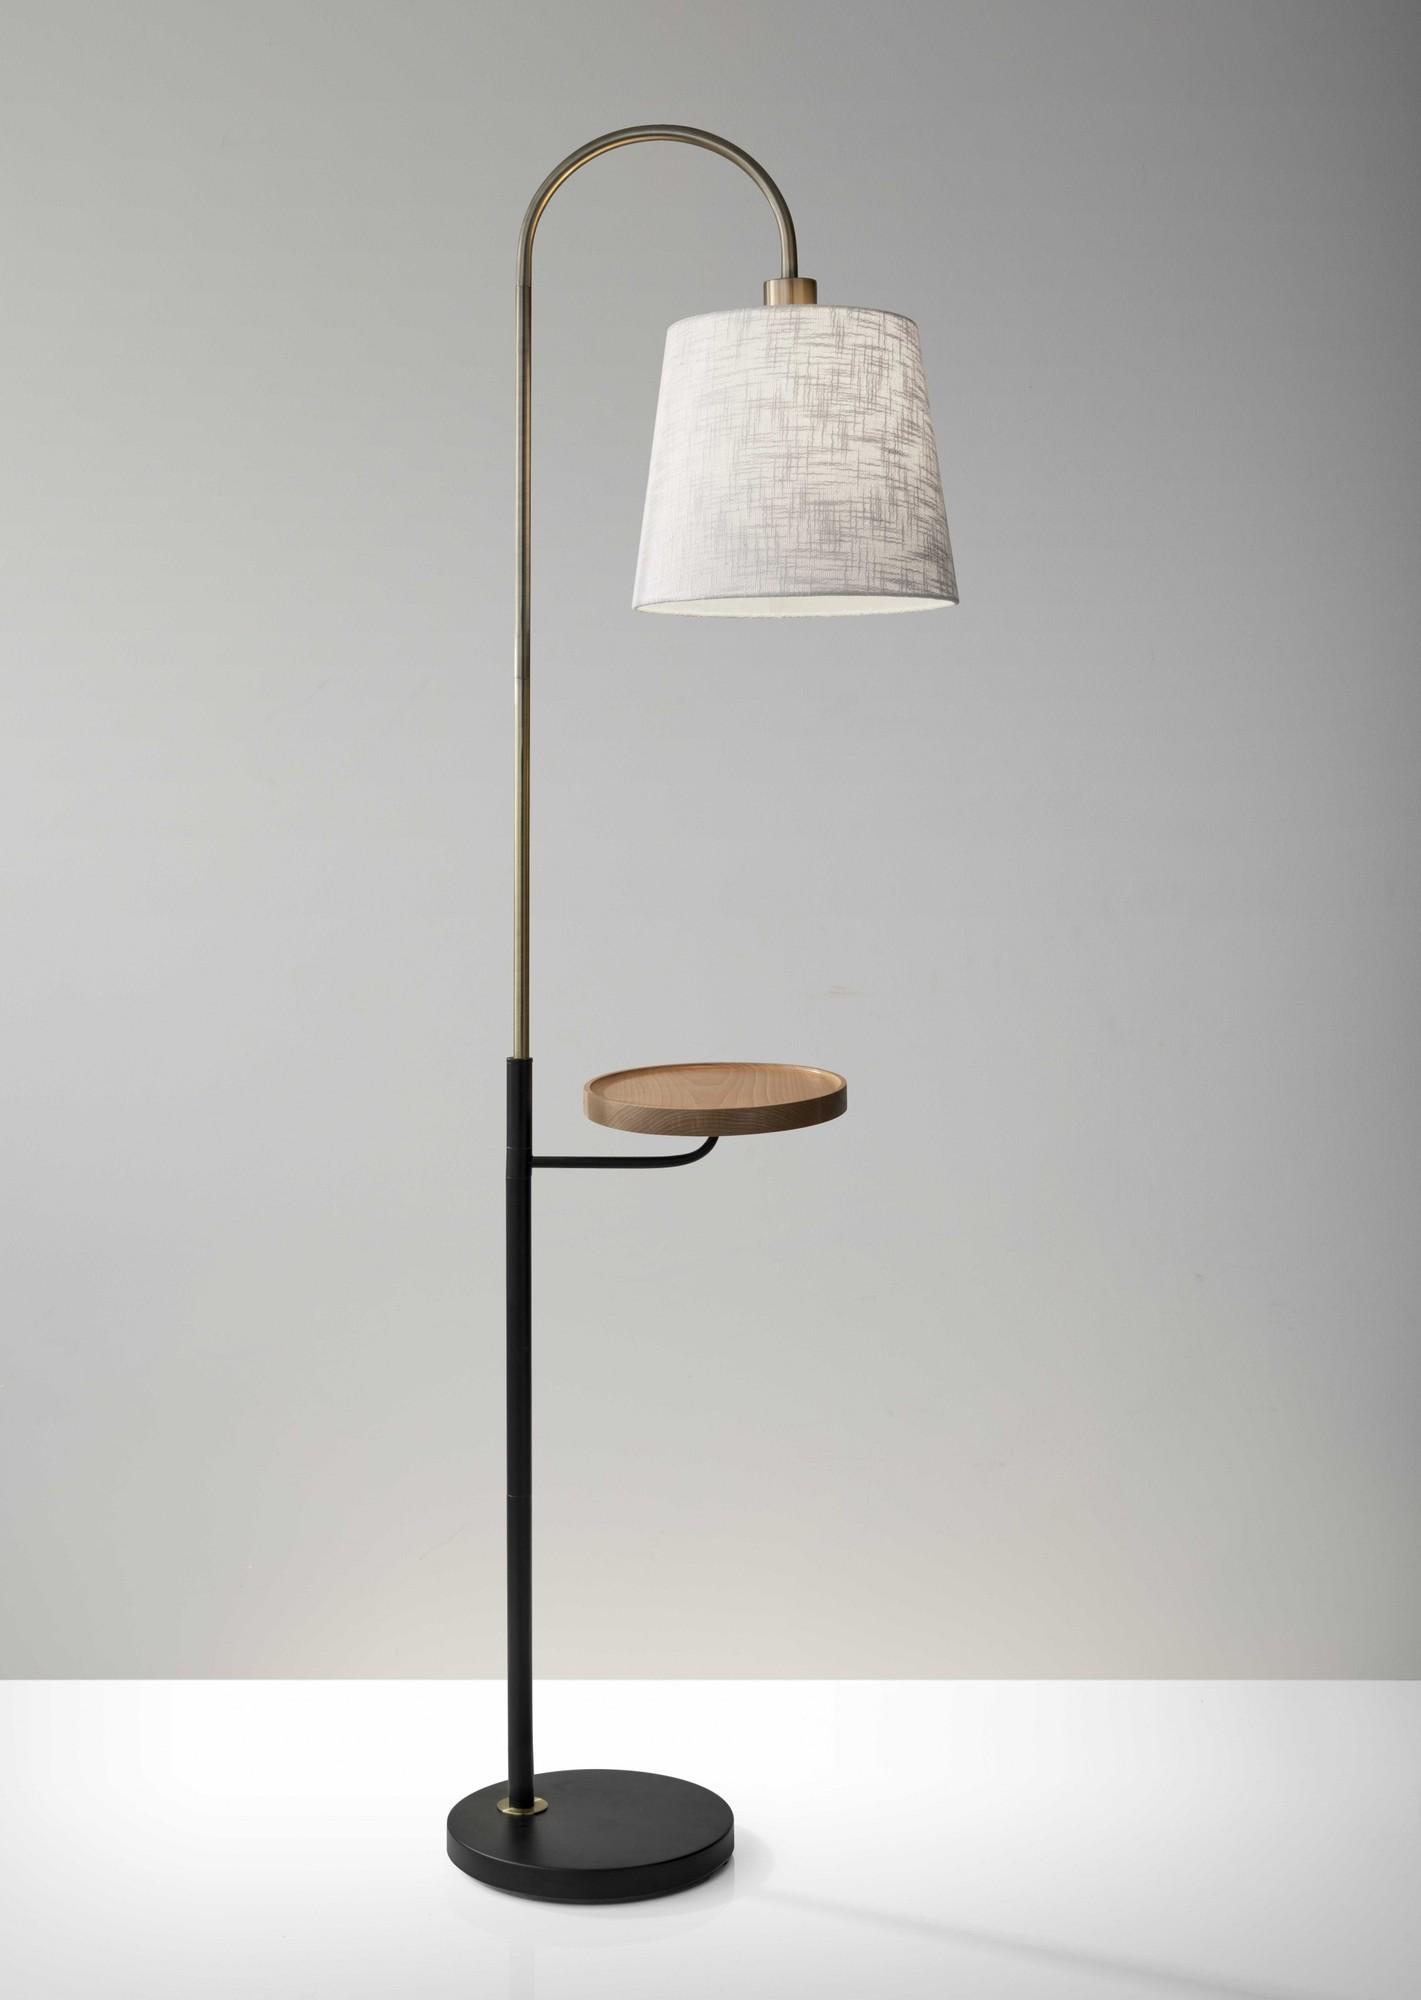 "11"" X 18.5"" X 65"" Brass Metal Fabric Shelf Floor Lamp"